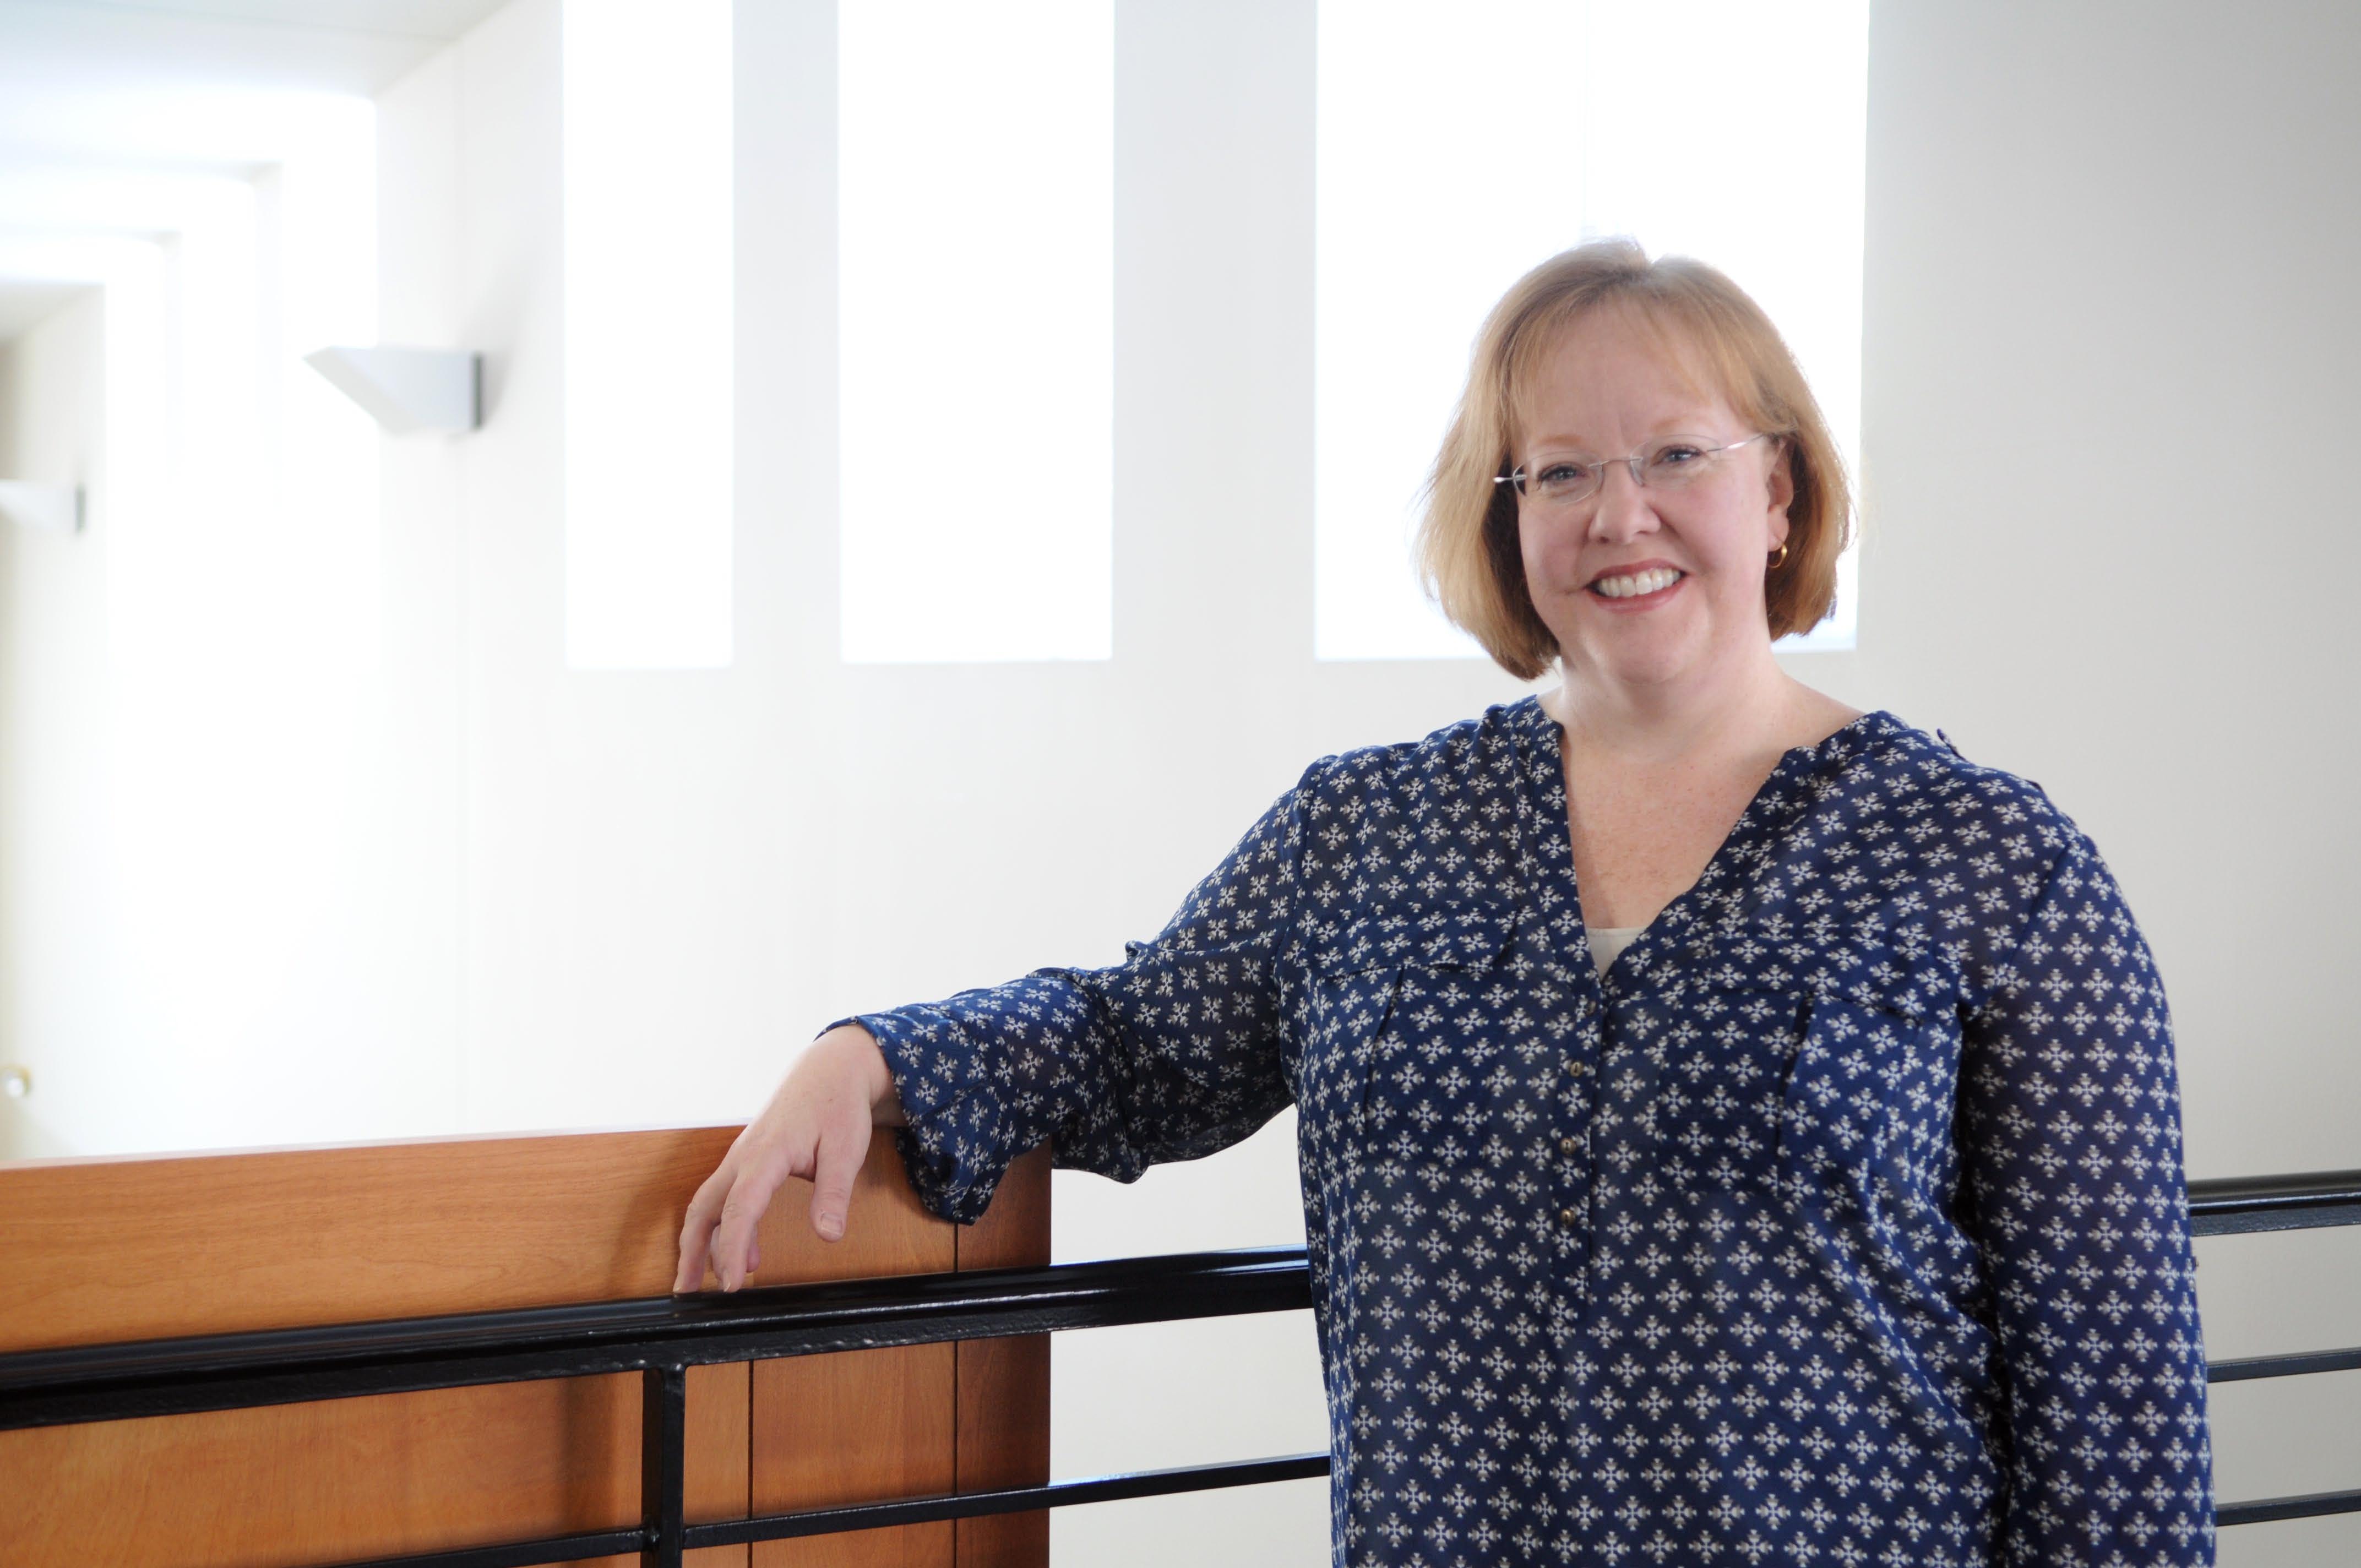 Catherine Steward, professor of history